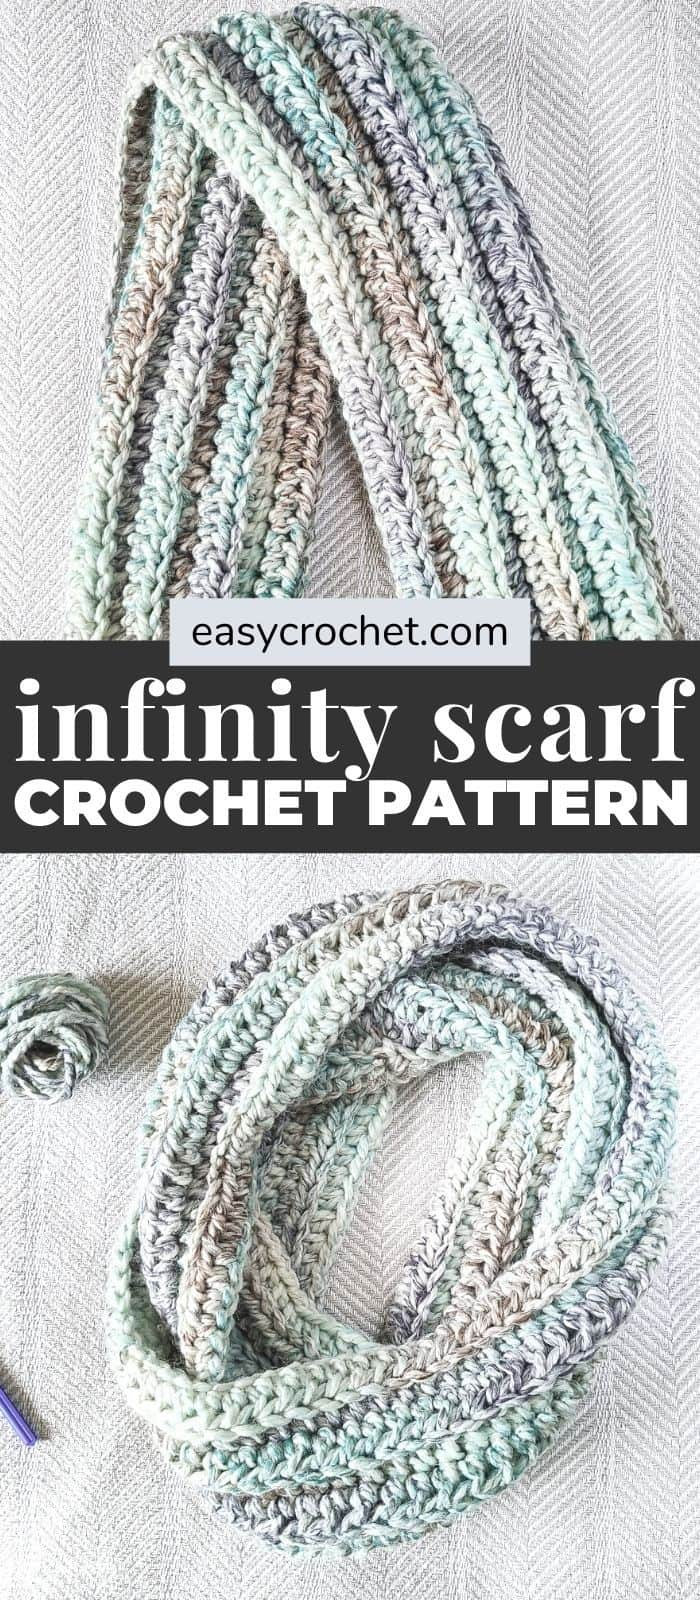 hdc infinity scarf via @easycrochetcom